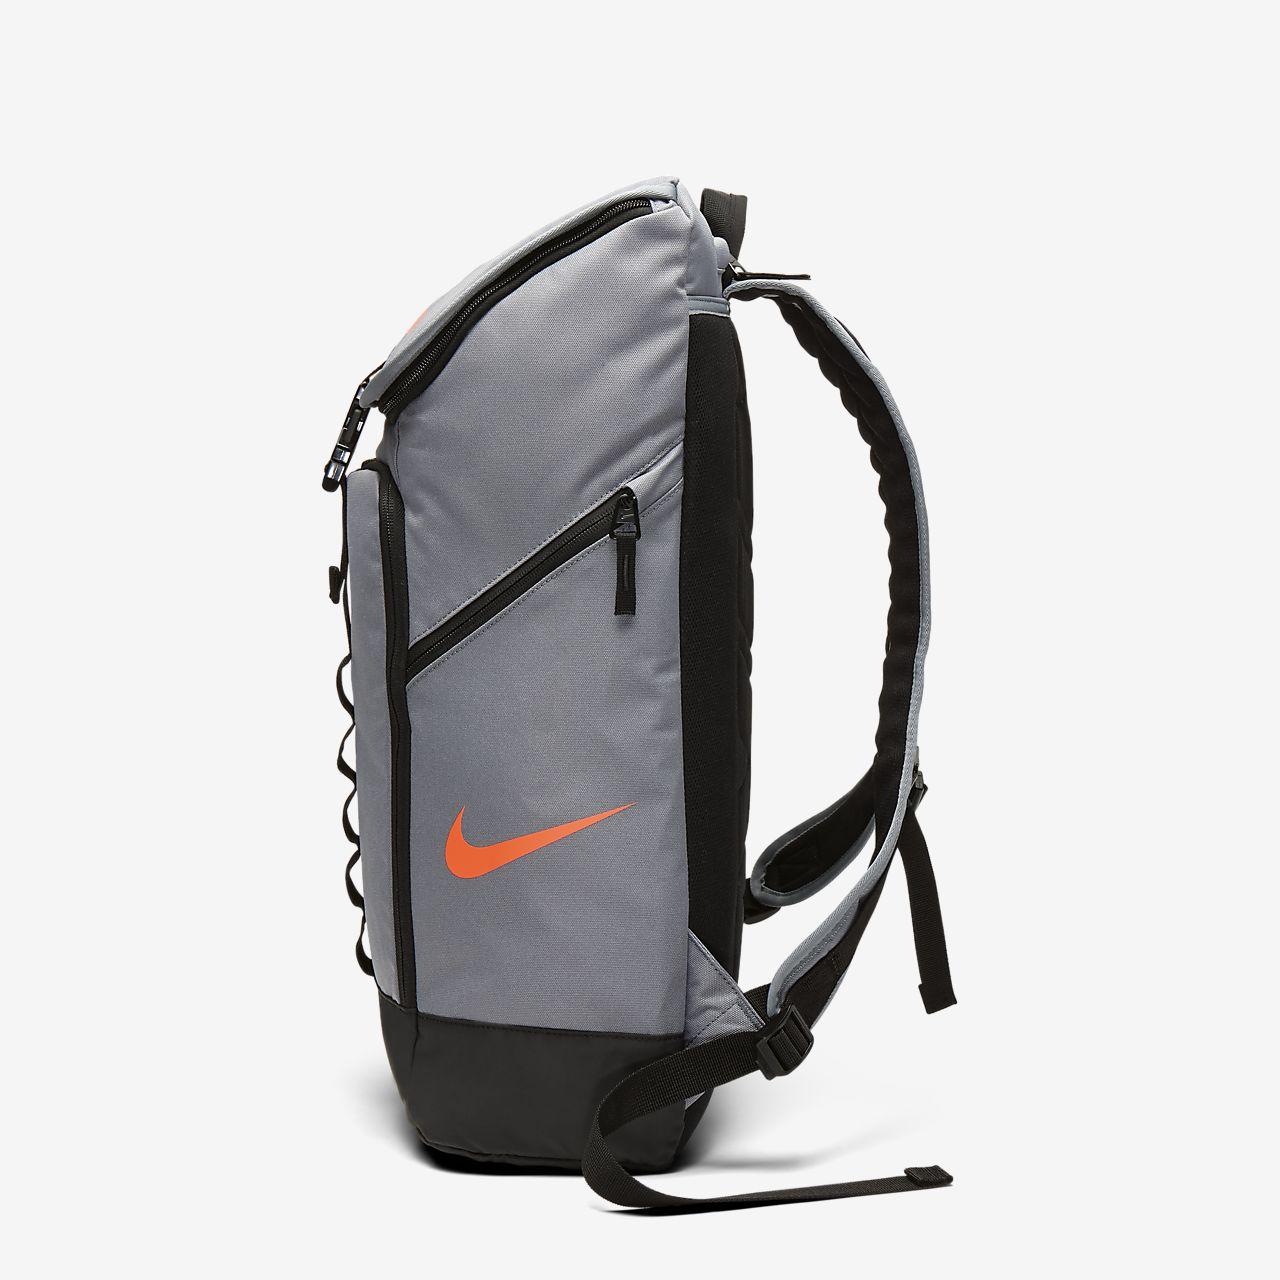 876e4b9afecd Nike Lebron Max Air Ambassador Backpack Com. Nike Vapor Max Air Backpack In  Gray For Men Lyst